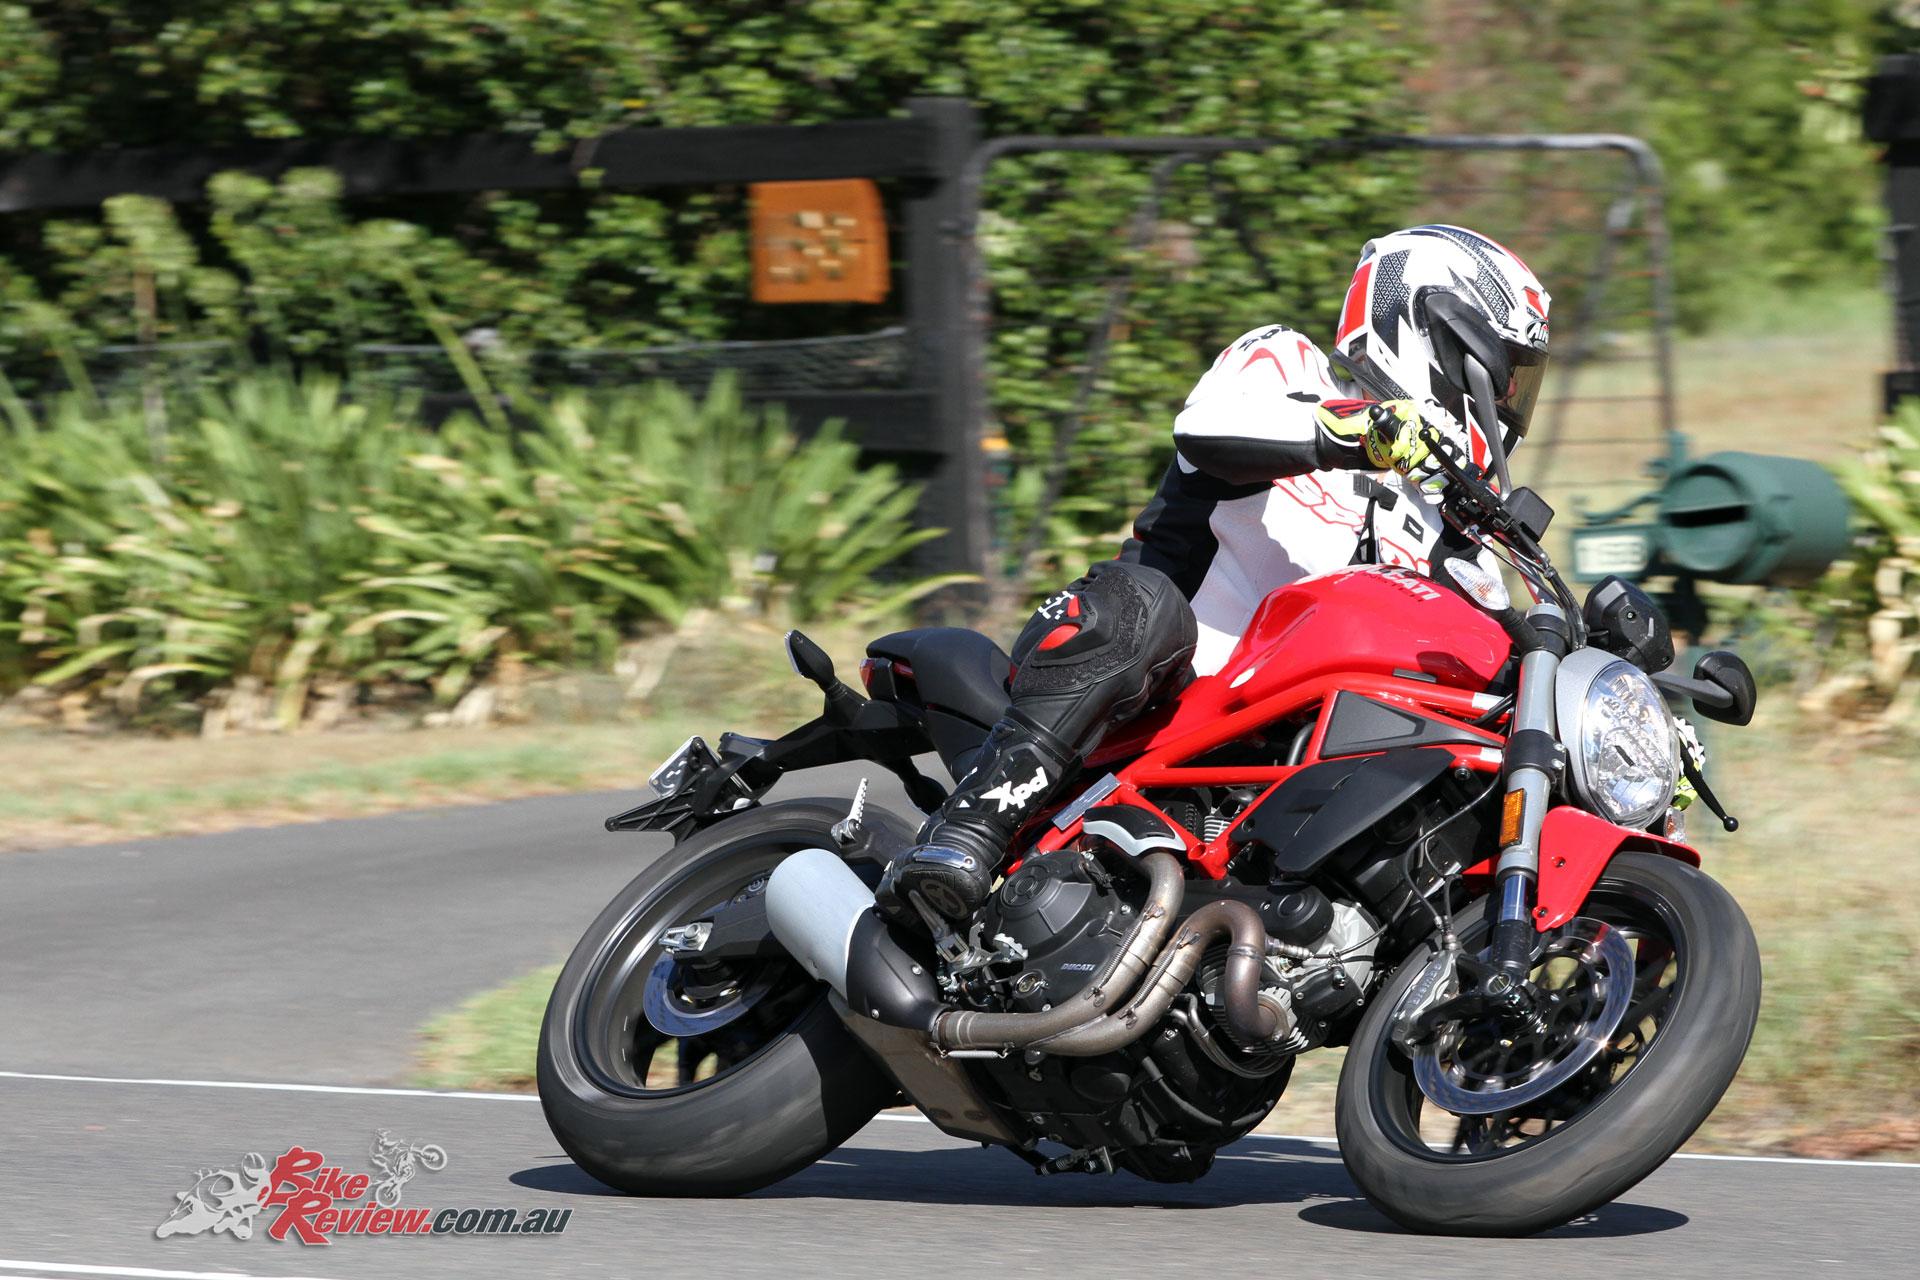 2018 Ducati Monster 659 LAMS